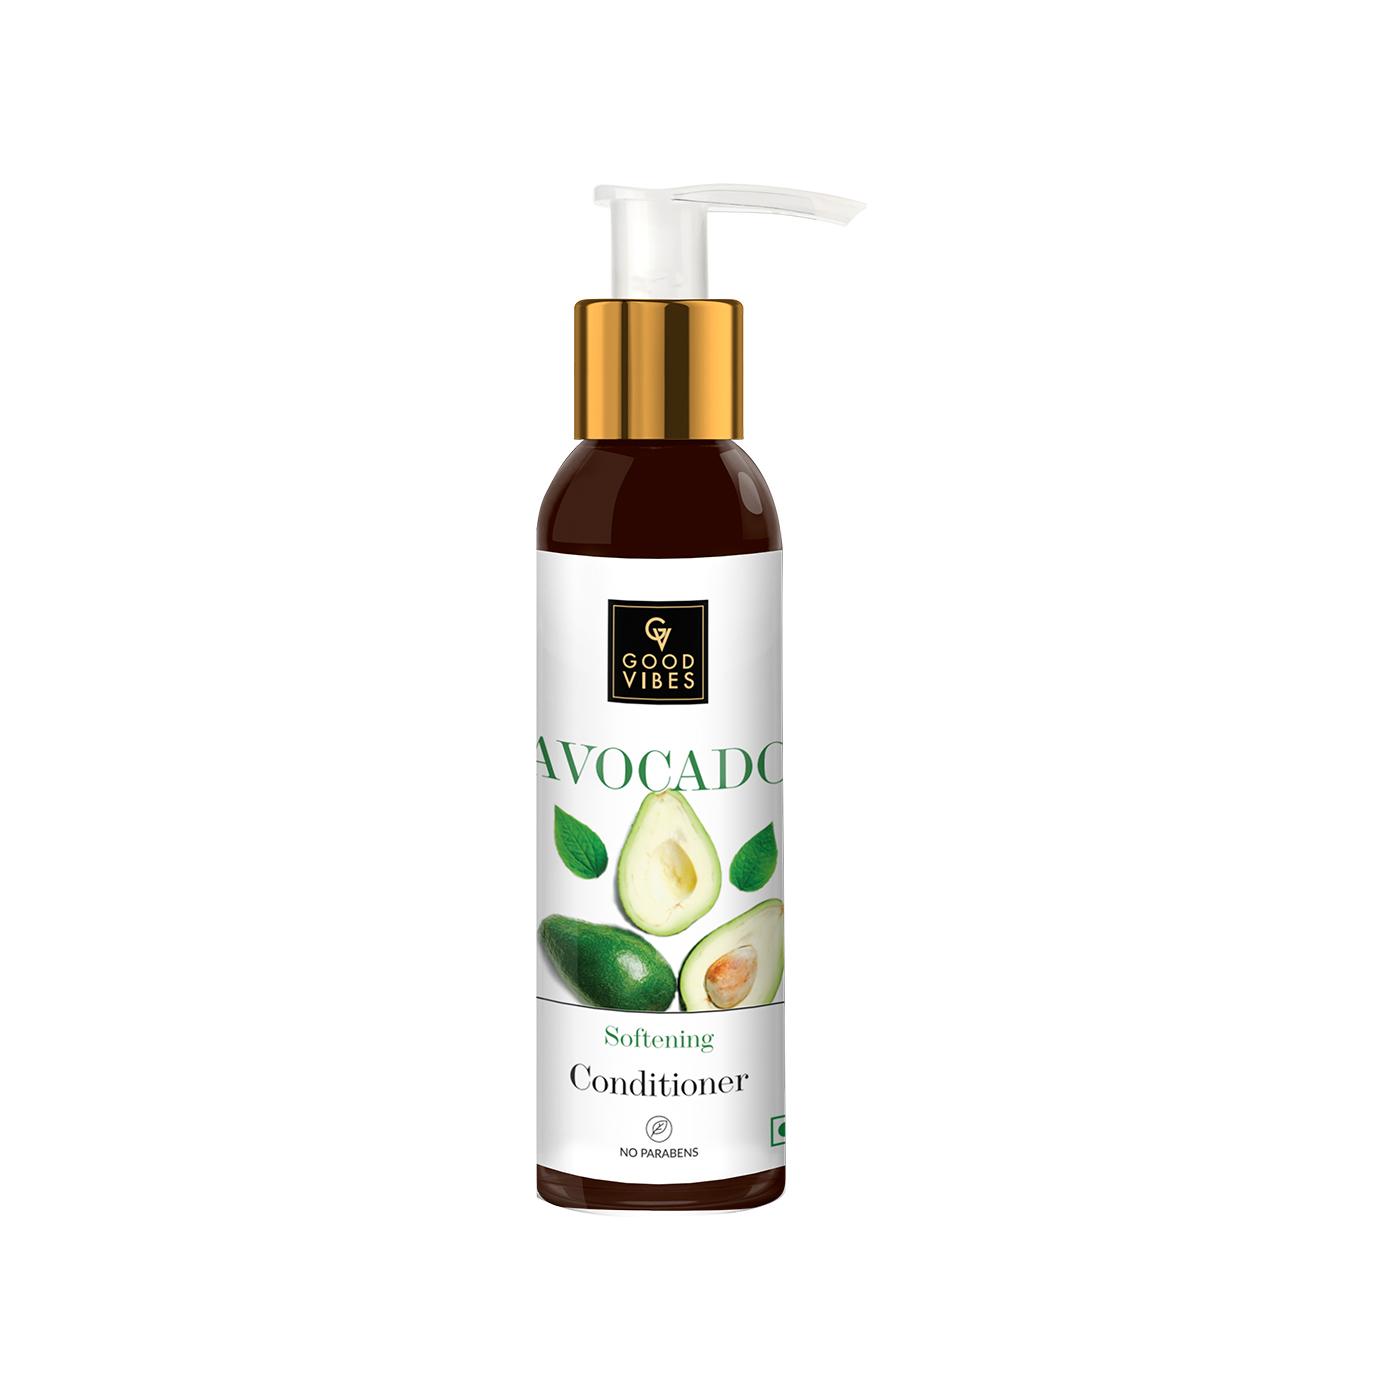 Good Vibes | Good Vibes Softening Hair Conditioner - Avocado (120 ml)